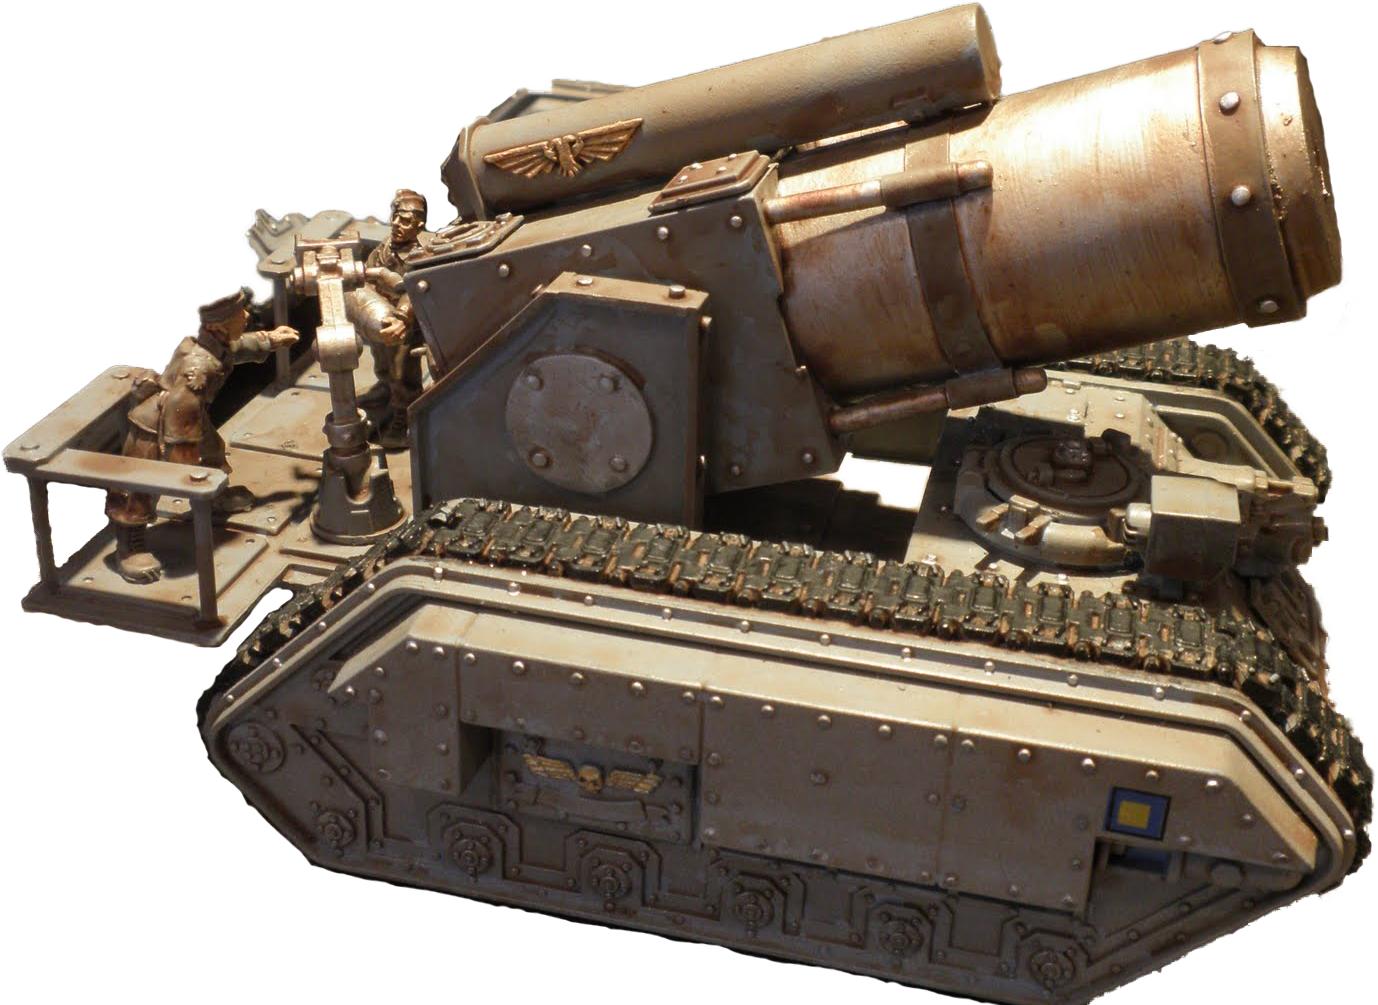 Colossus (Siege Tank)